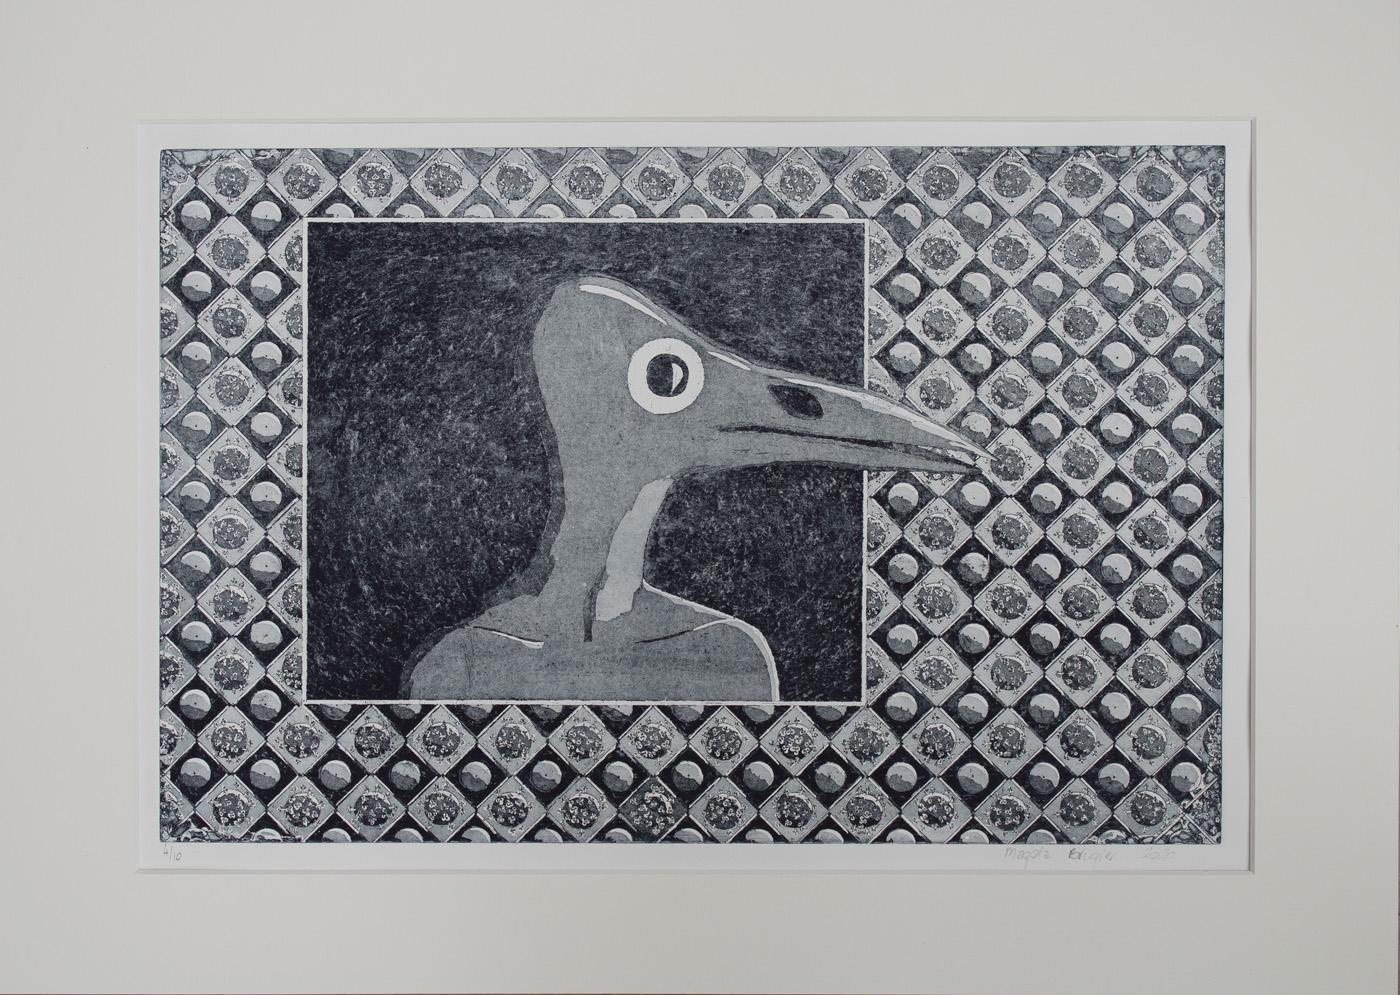 Life Patterns aquatint etching - plague doctor 2